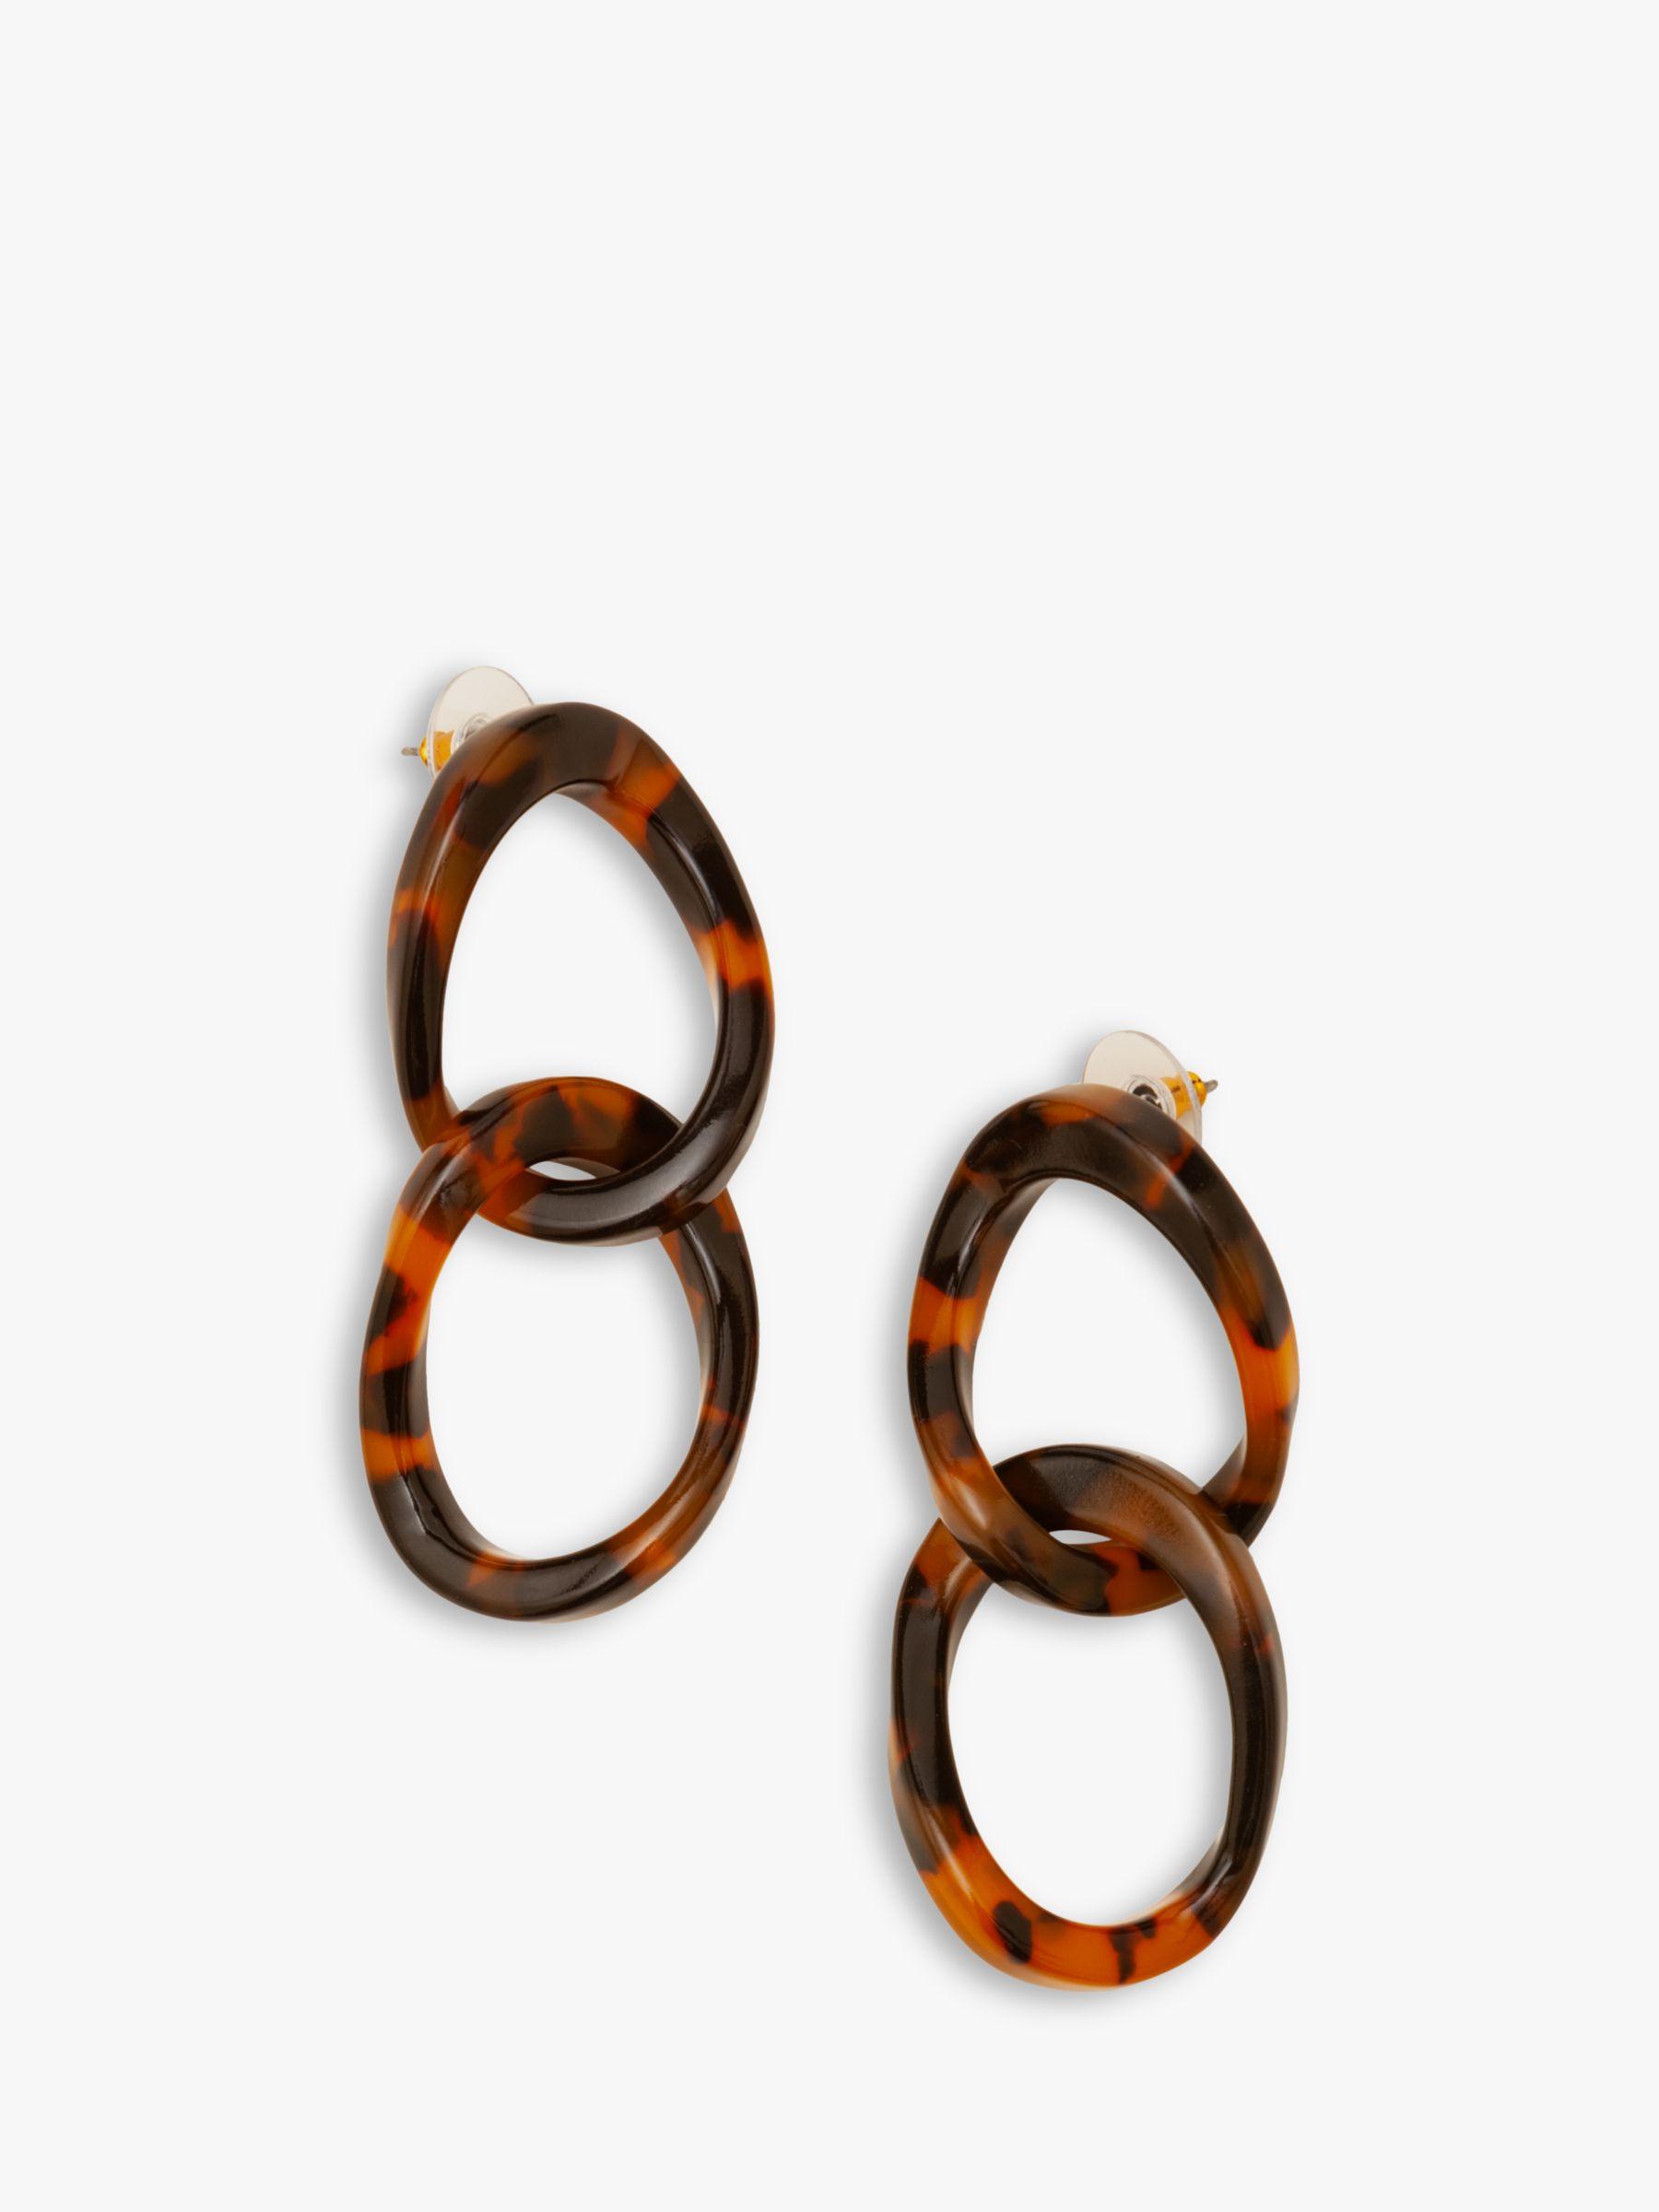 Boden Boden Resin Link Drop Earrings, Brown